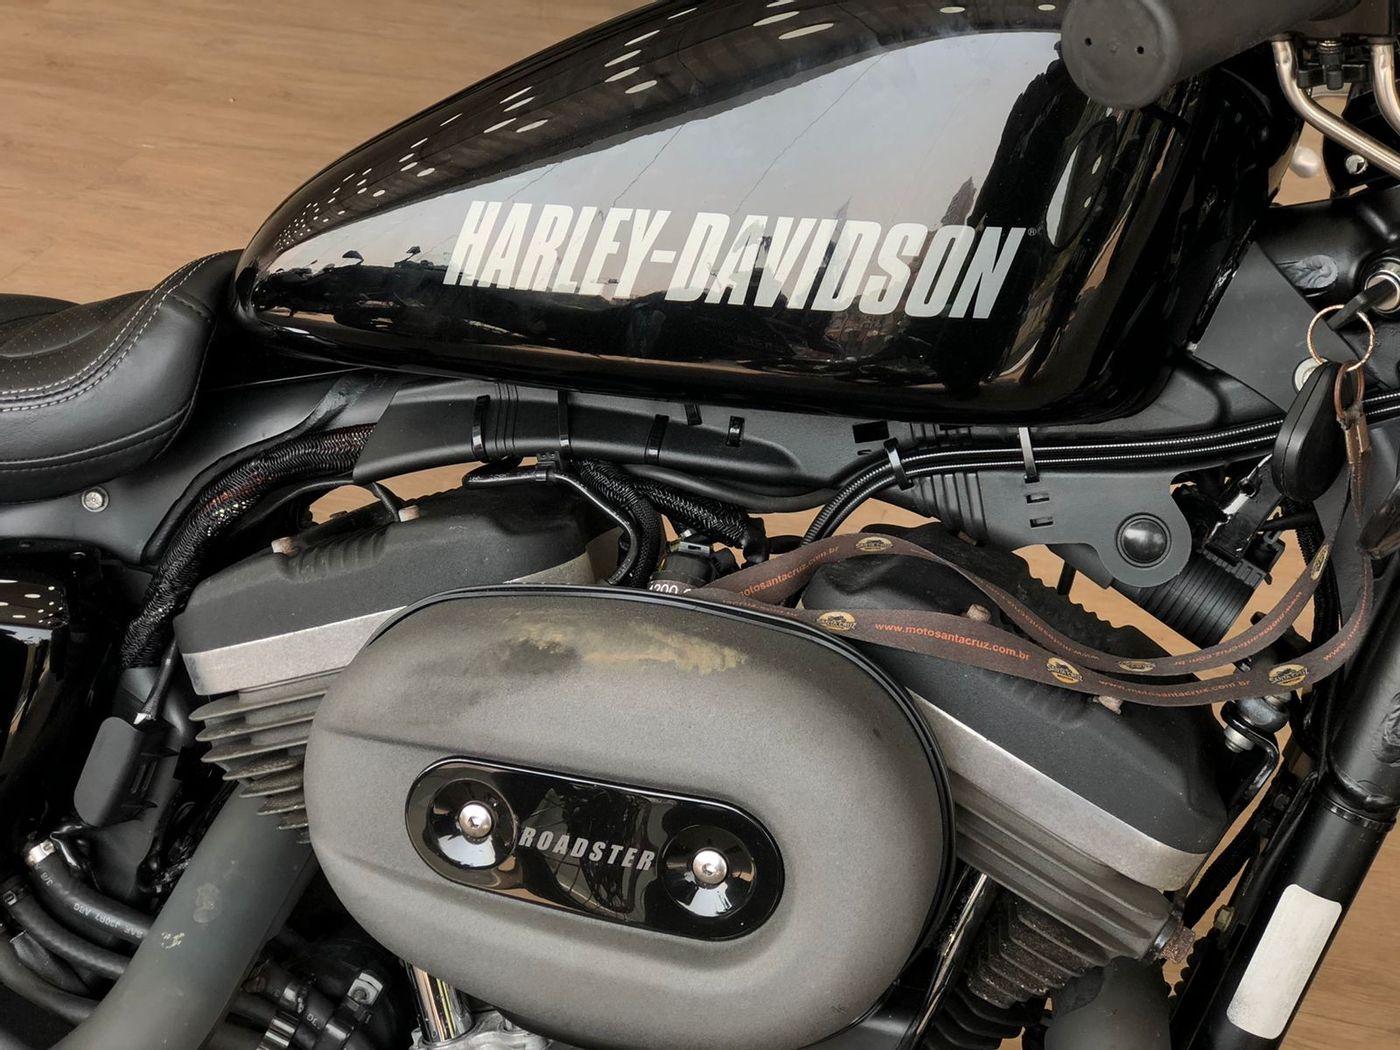 Harley XL 1200 CX ROADSTER